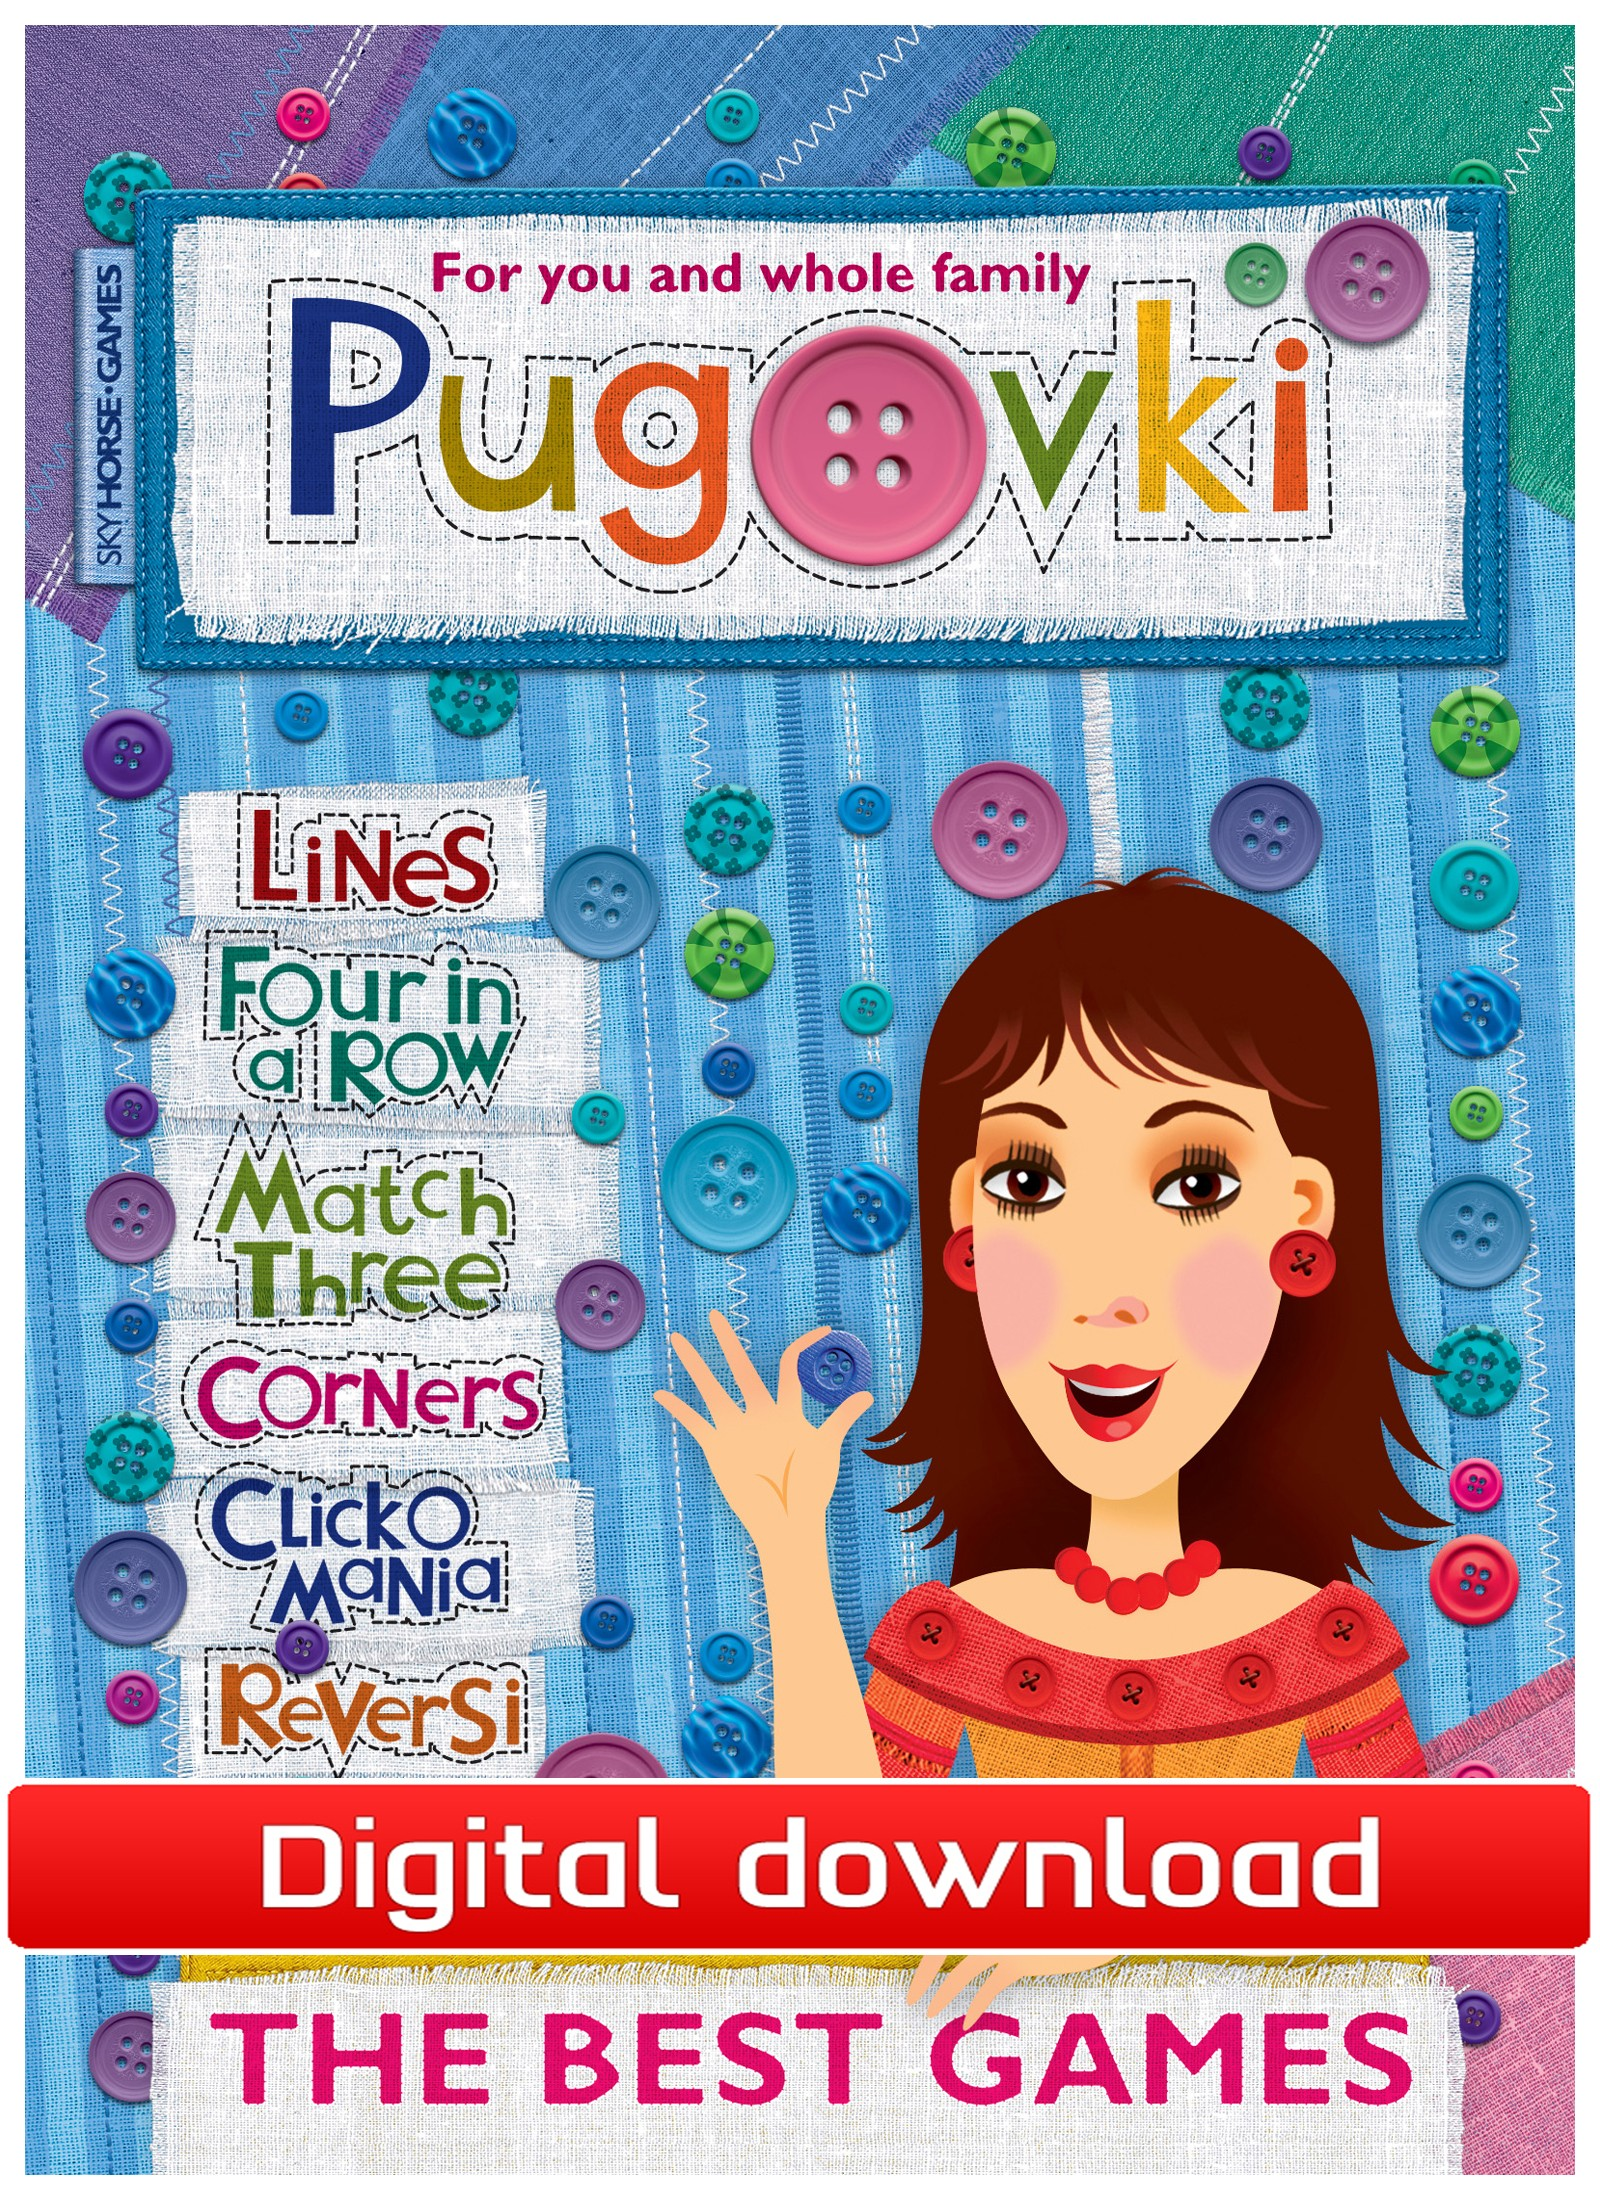 Pugovki, Buttons (PC nedlastning) PCDD25371